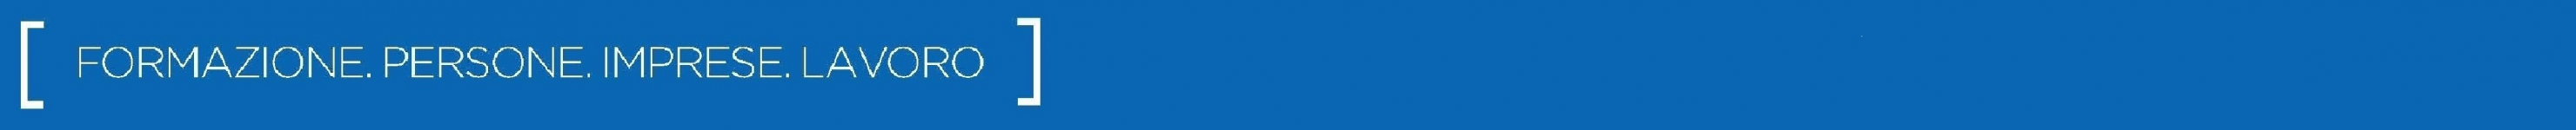 Logo of Ial Board